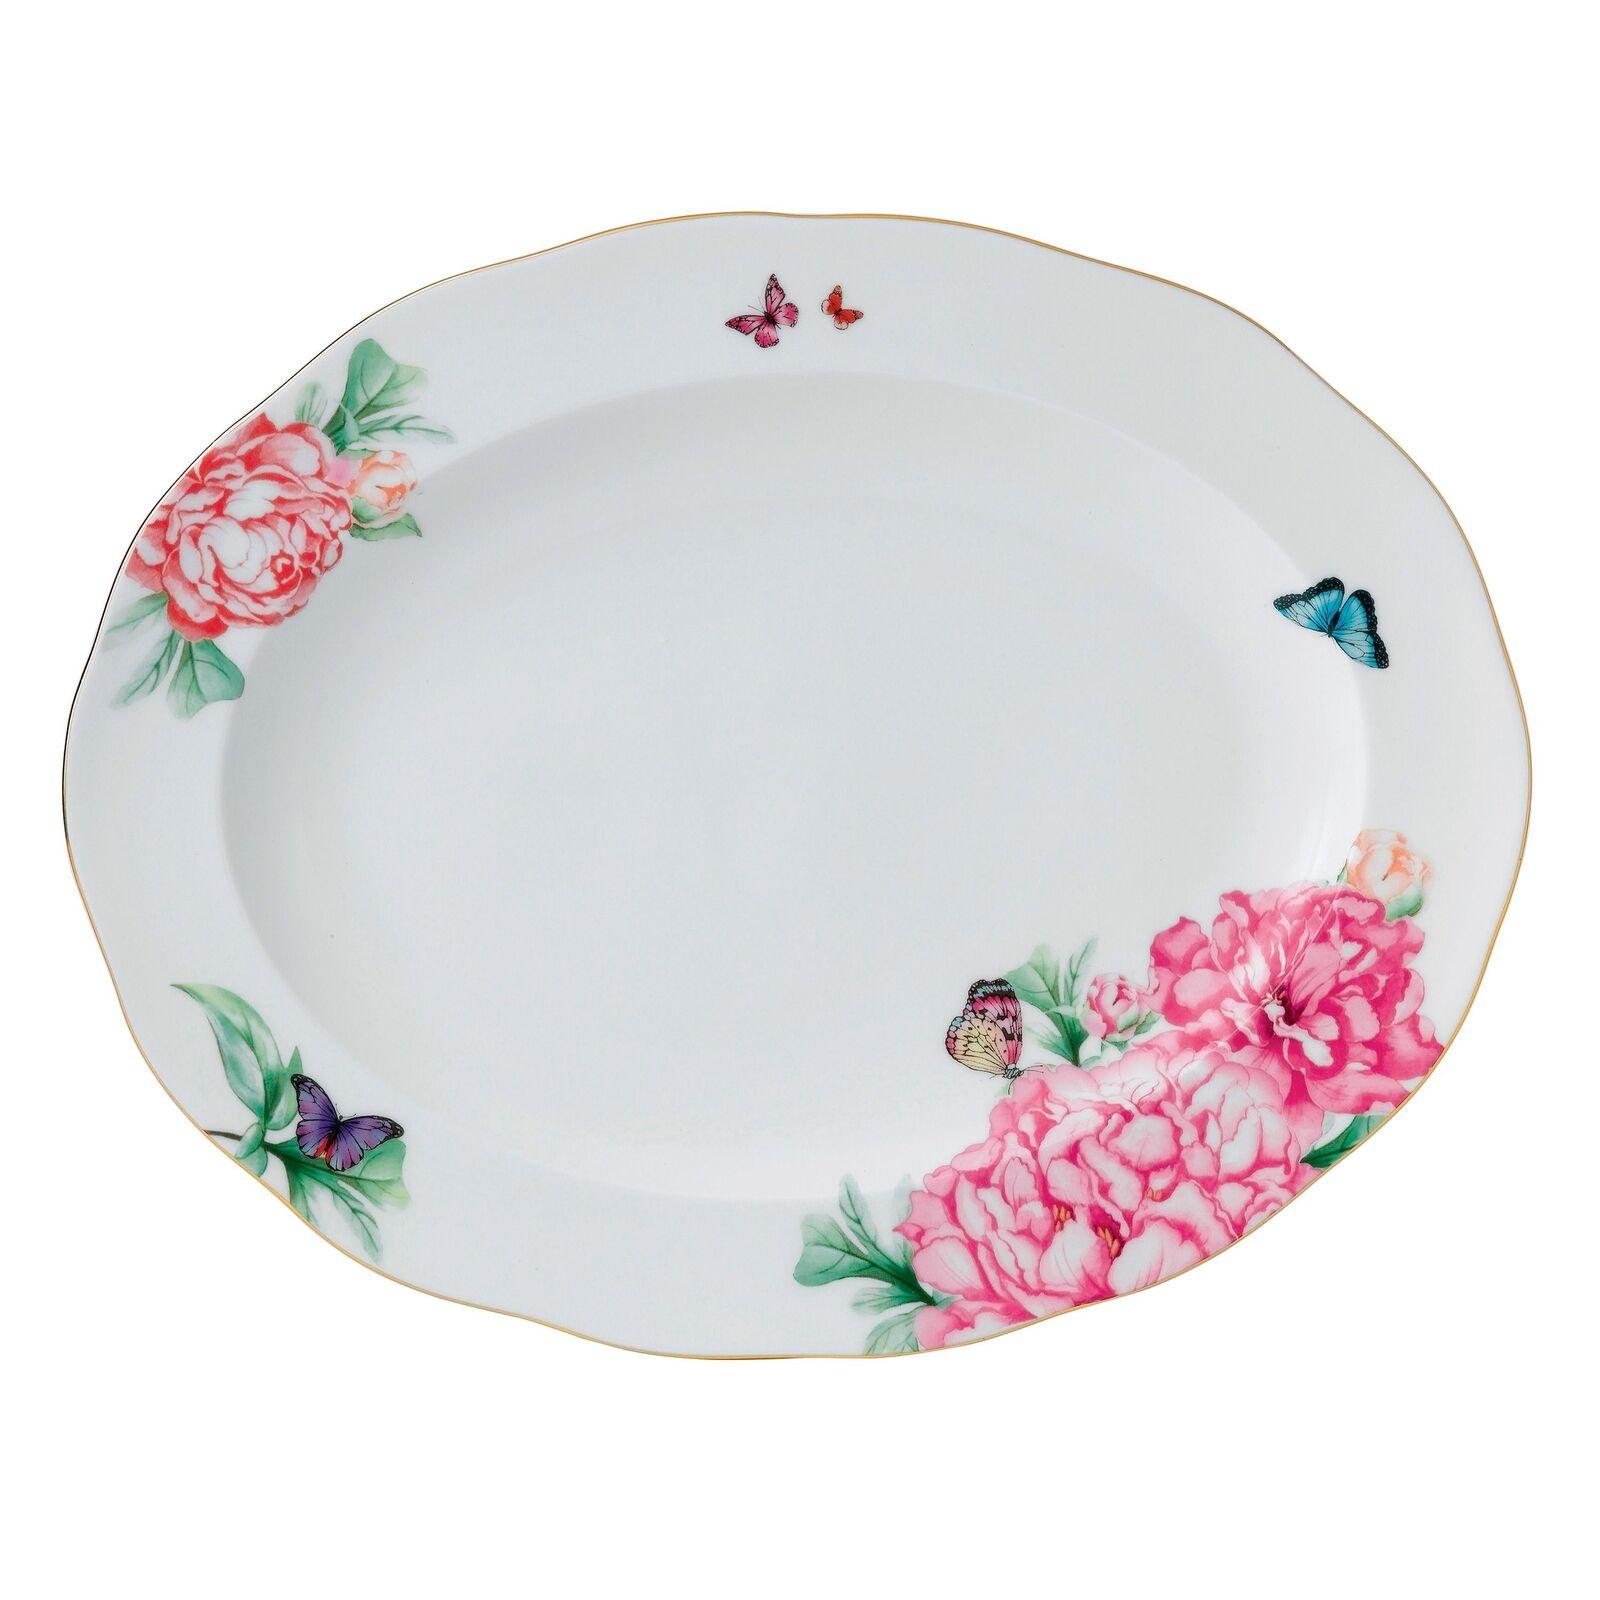 Royal Albert Miranda Kerr Friendship Oval Platter 33cm